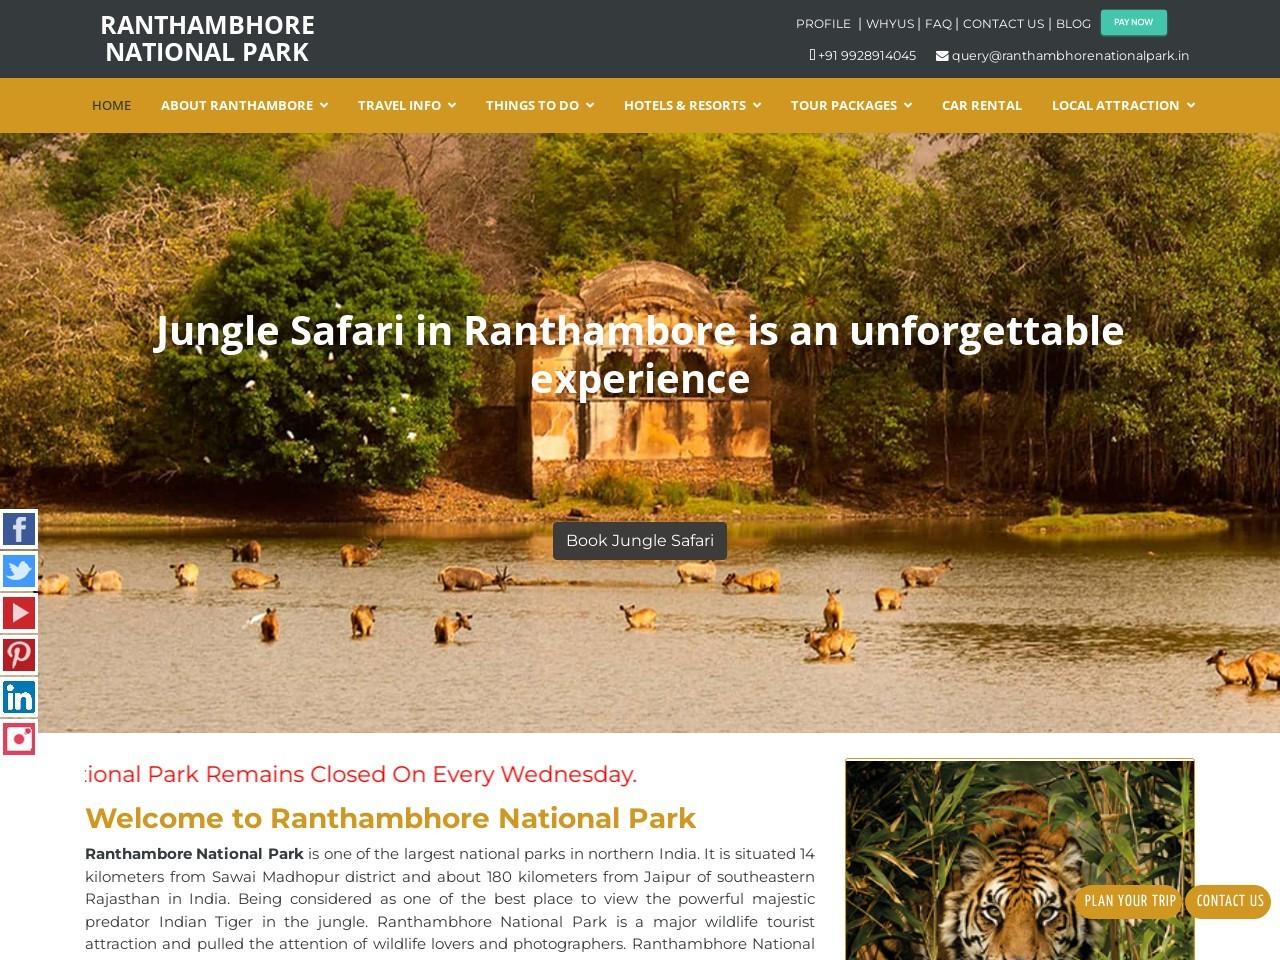 Ranthambore safari online booking | Ranthambore jeep safari booking online